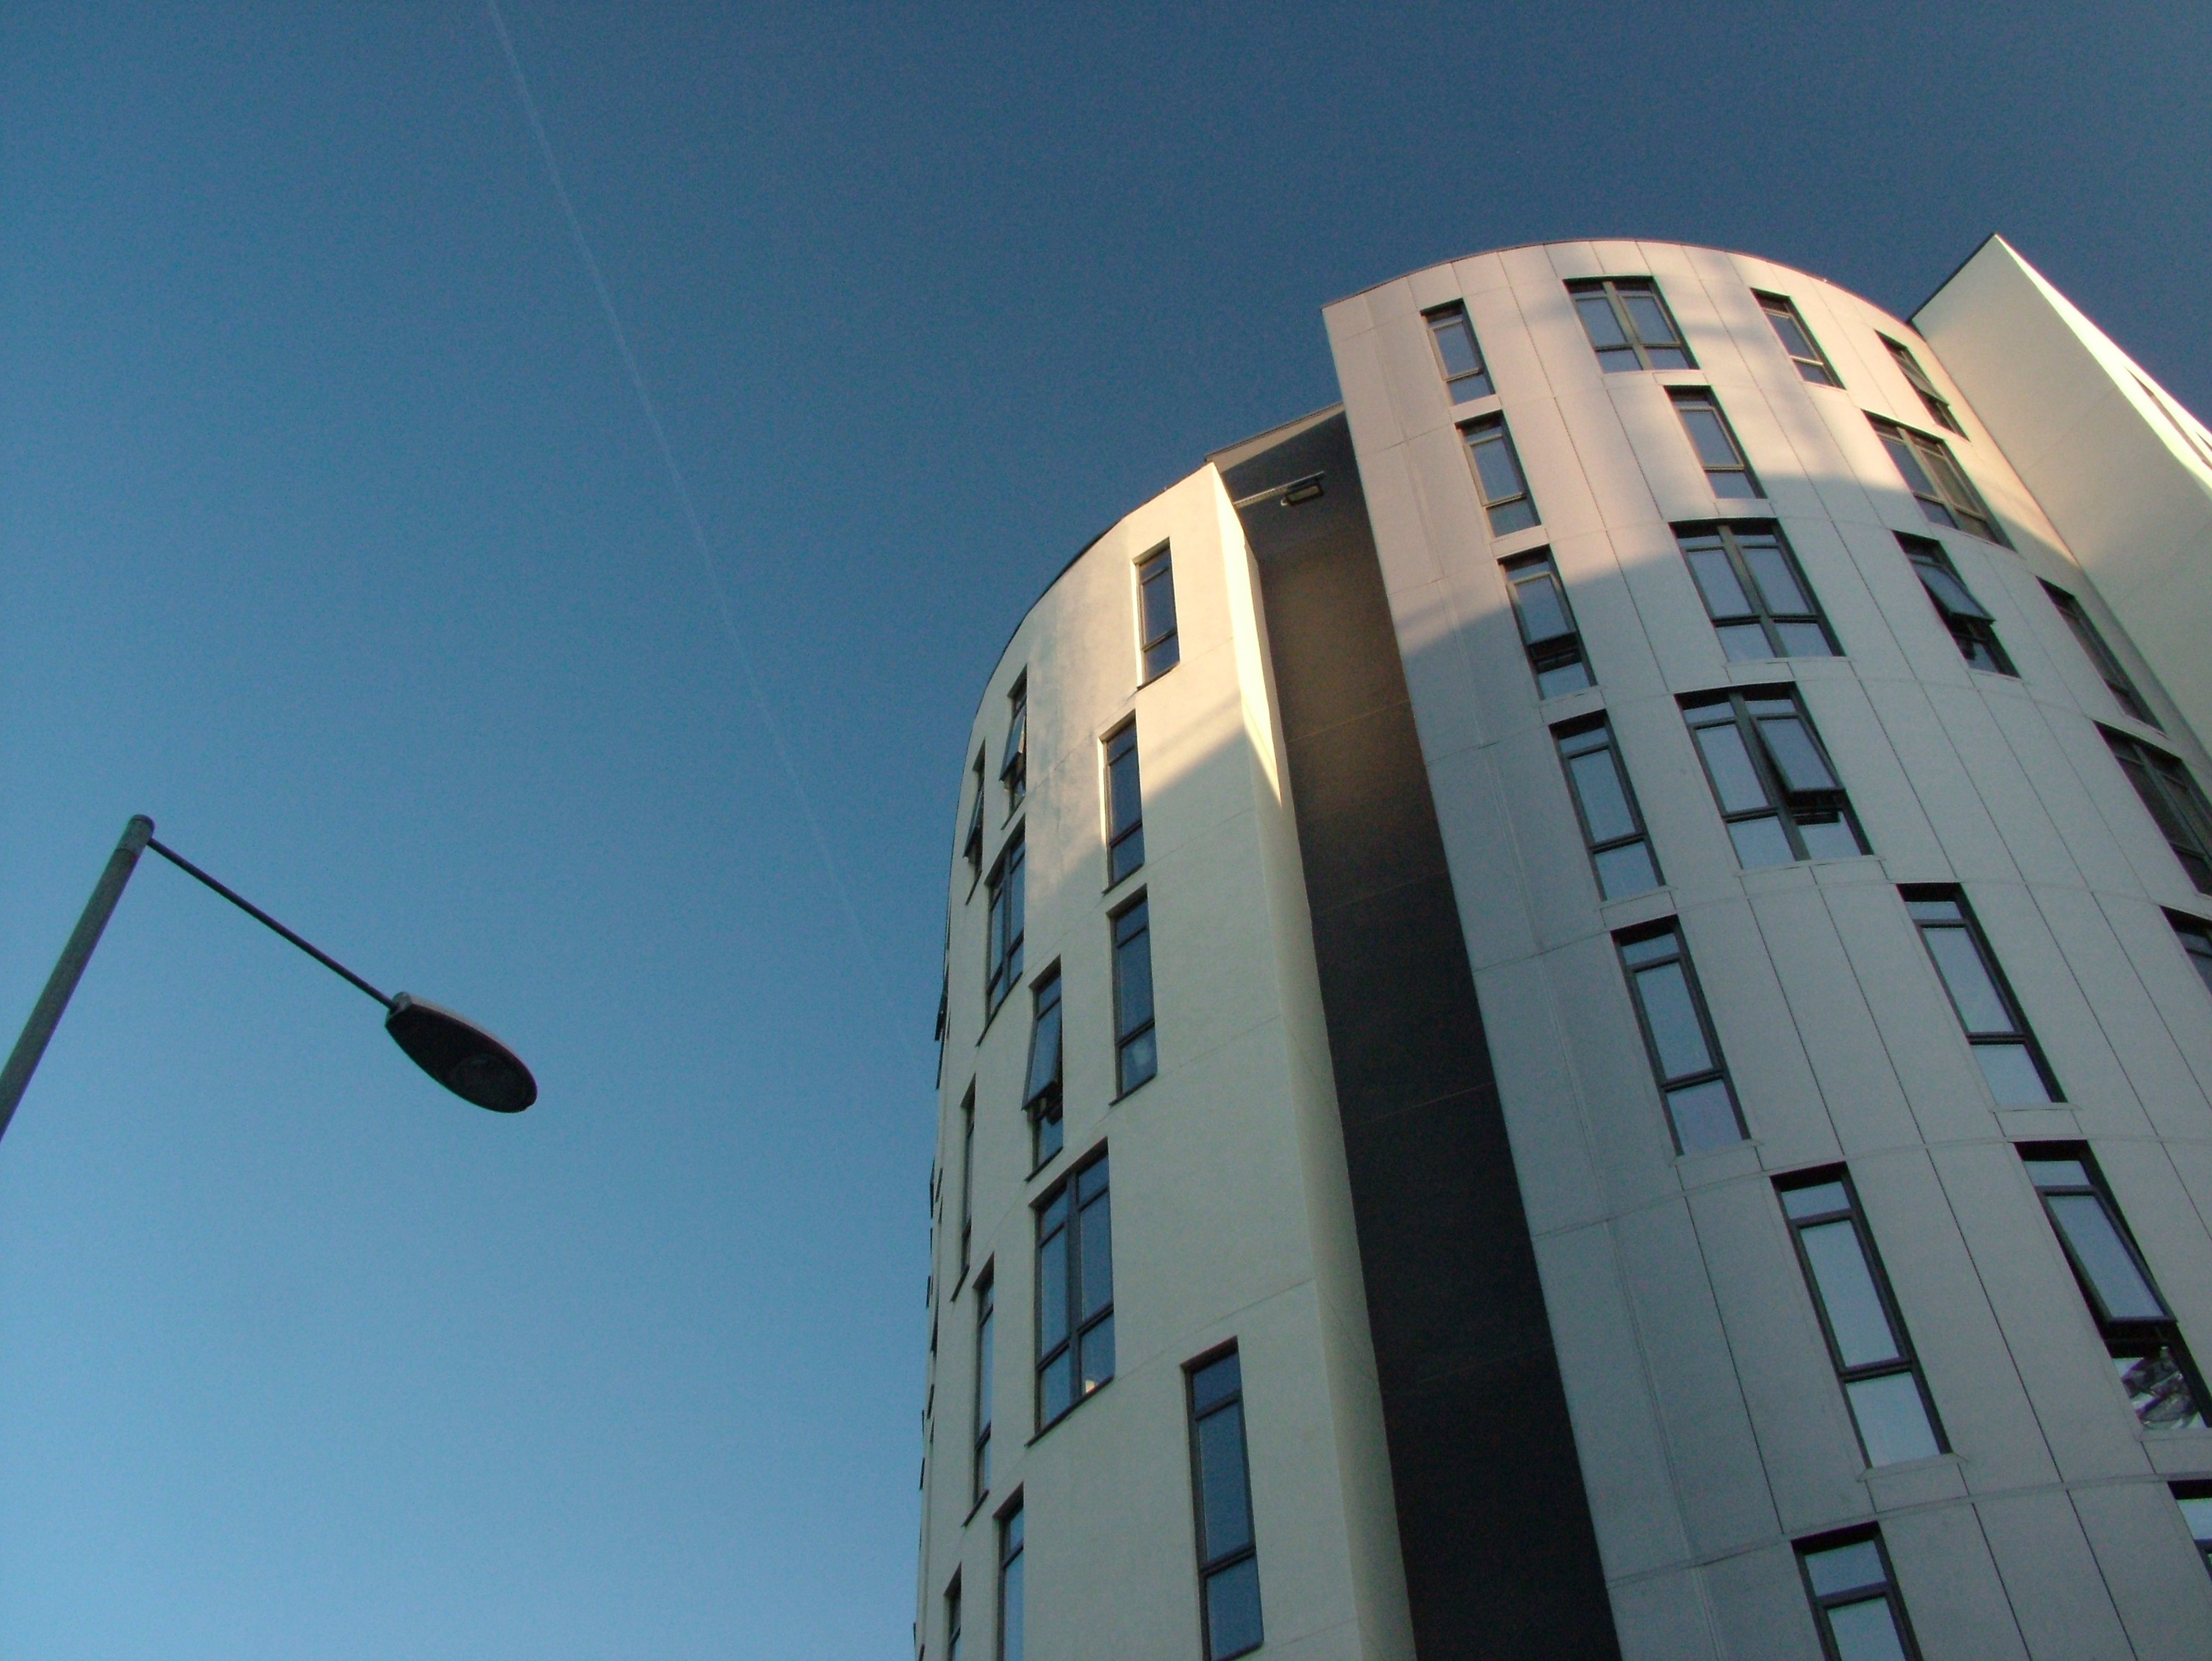 Nick Everton House, Manchester